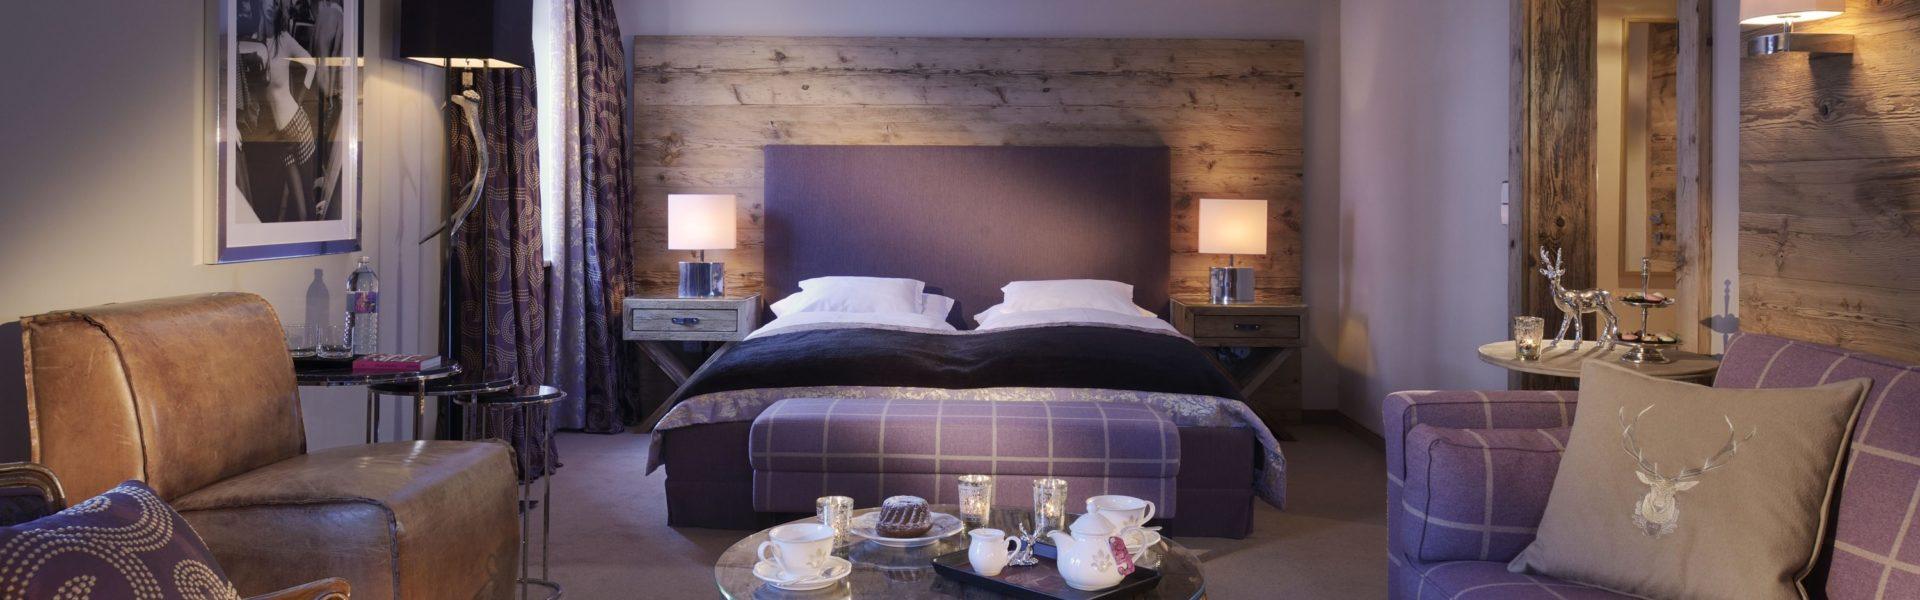 Golfhotel Vorarlberg, Hotel Arlberg Lech, Exklusives Ambiente (c) Hotel Arlberg